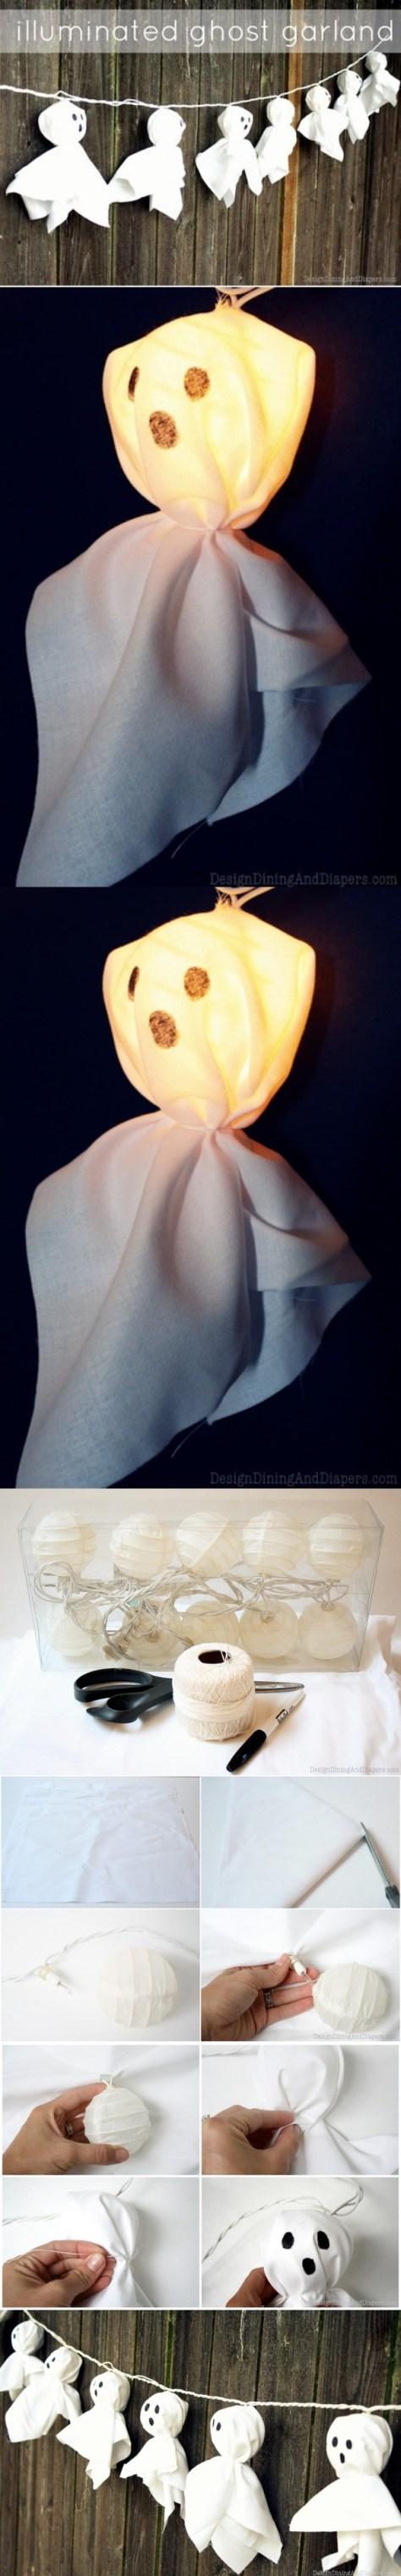 6. Illuminated Ghost Garland